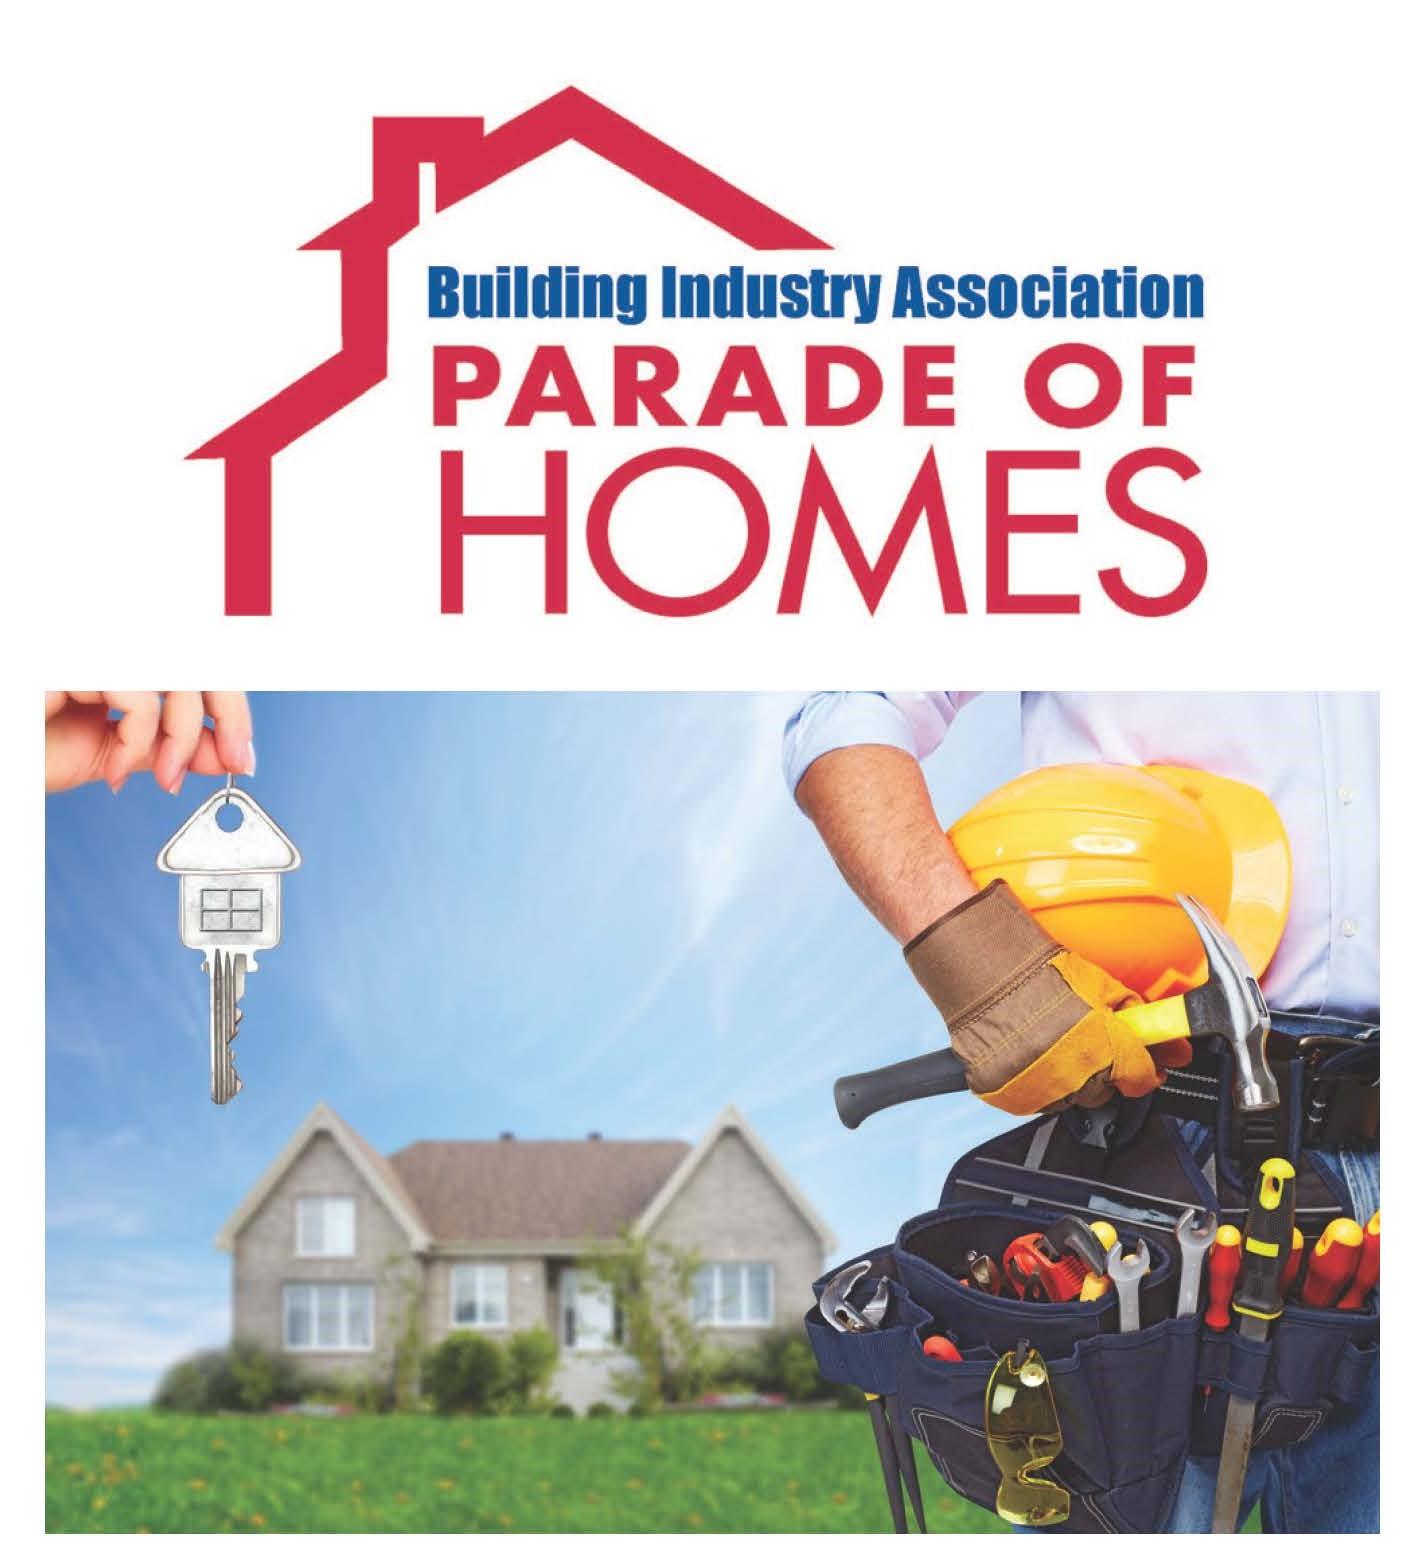 BIA Parade of Homes